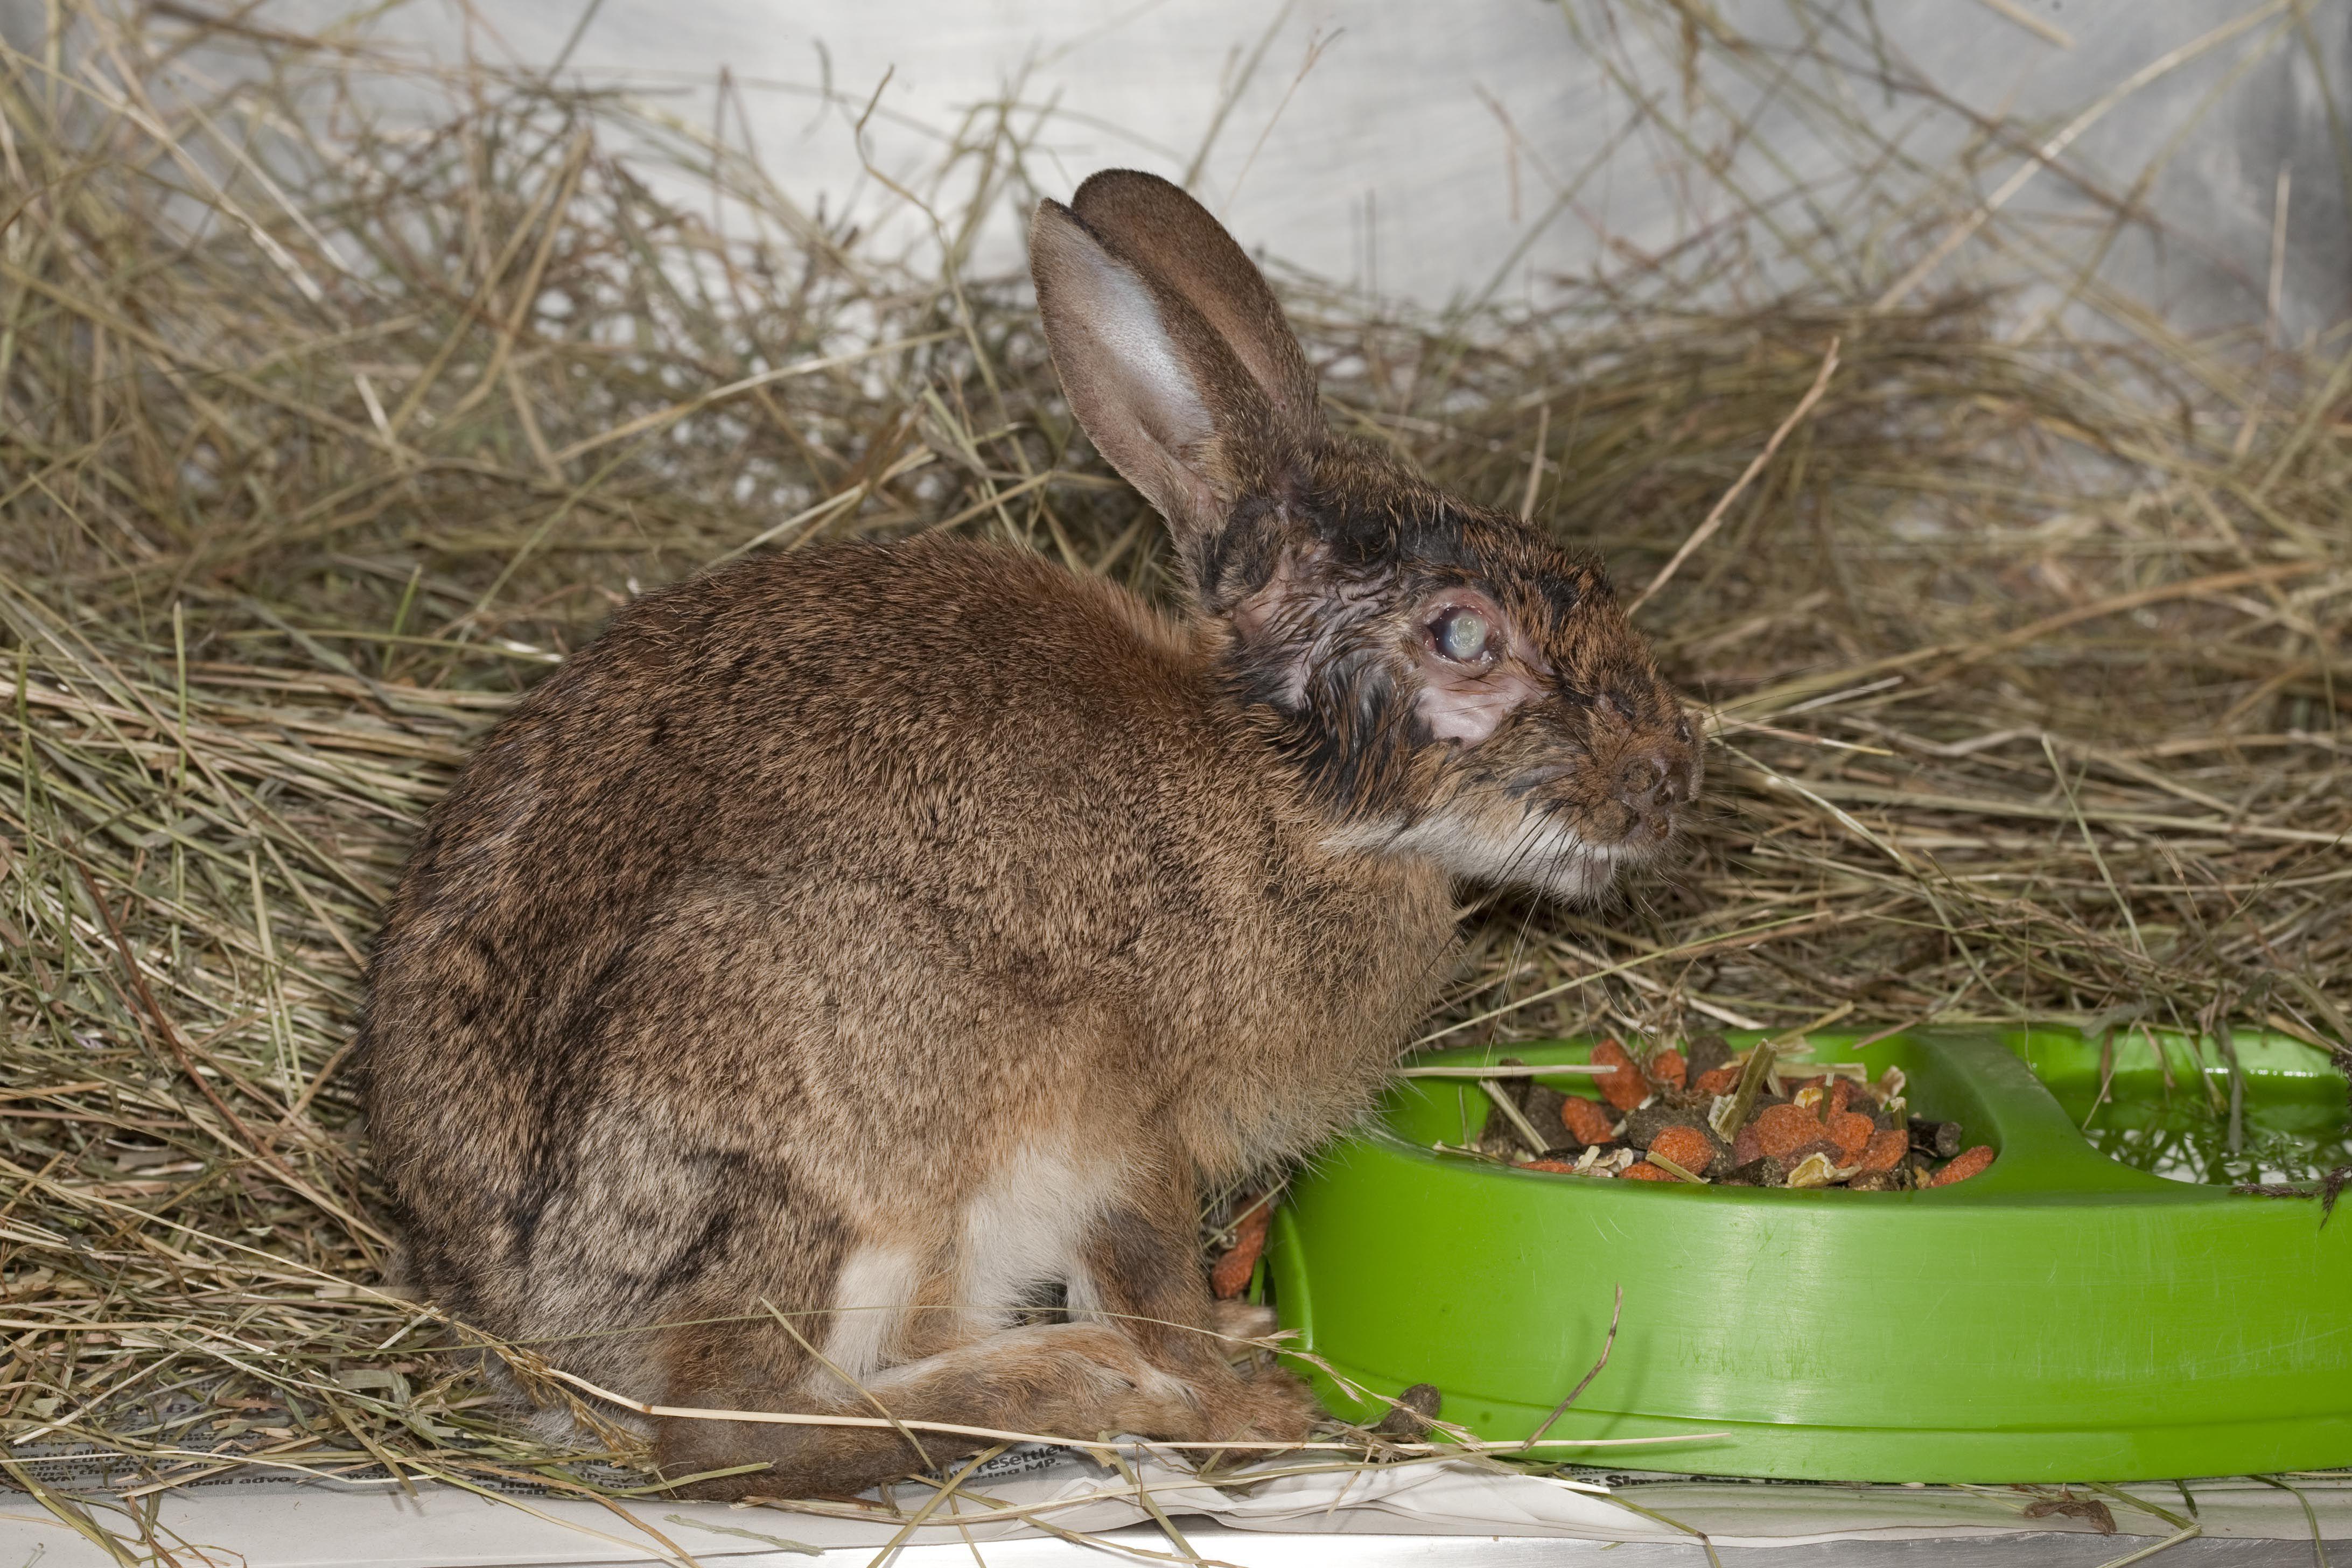 Rabbit (Oryctolagus cuniculus) recovering from Myxomatosis, feeding, UK